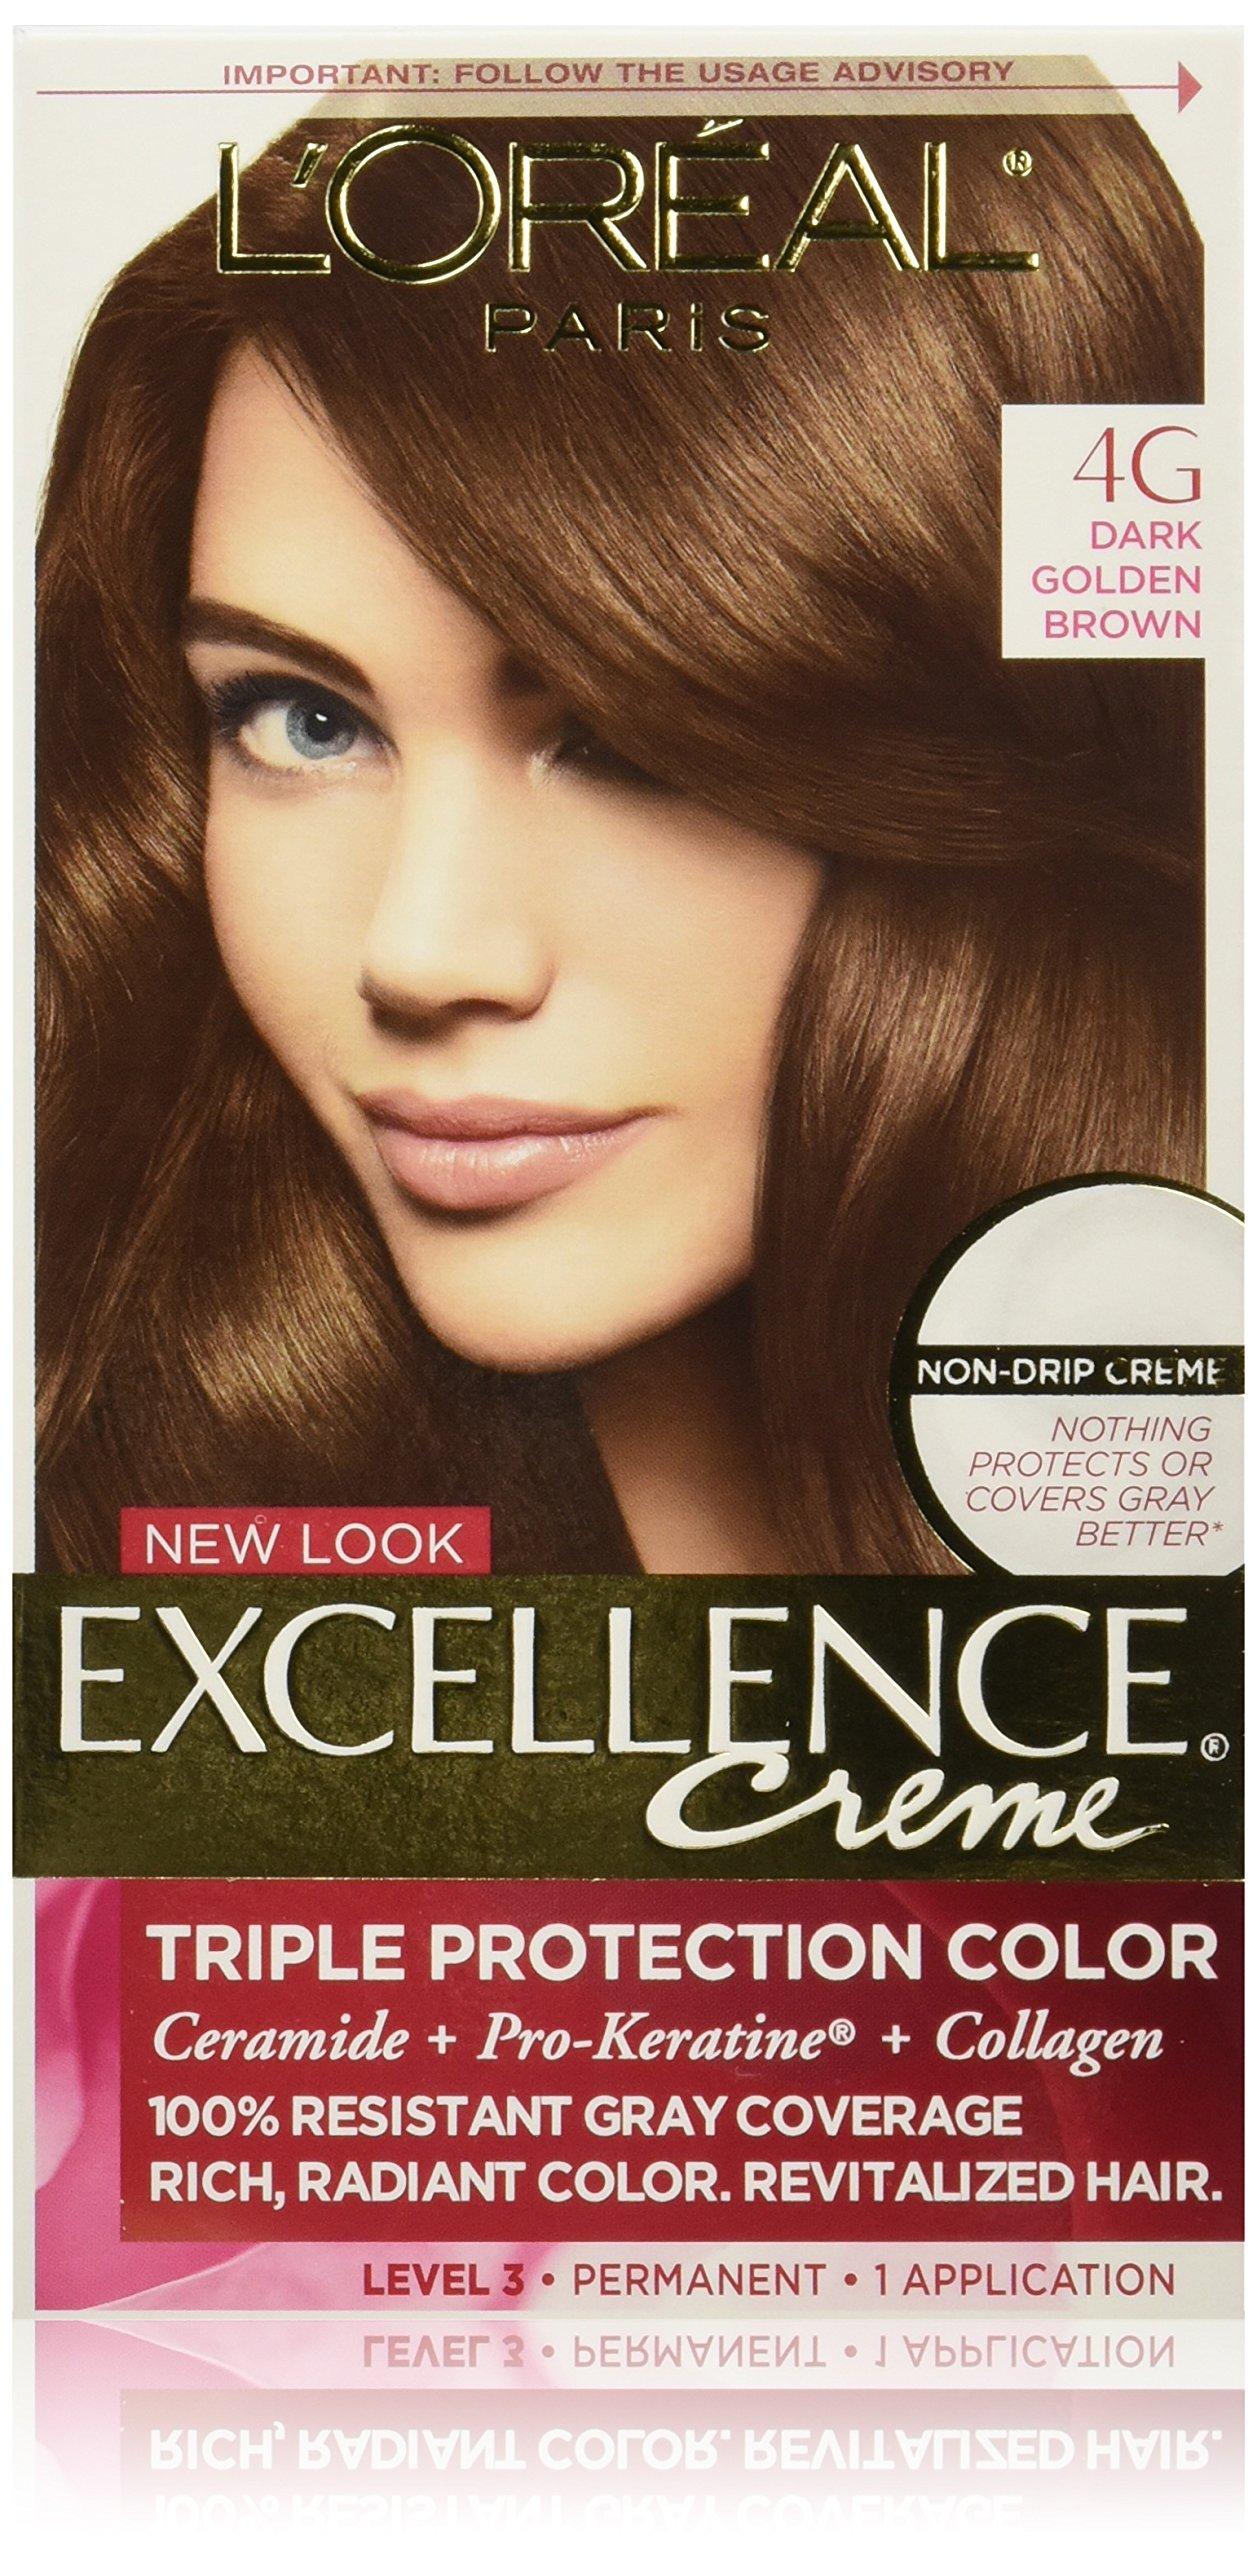 Loreal Paris Excellence Creme Hair Color 4g Dark Golden Brown